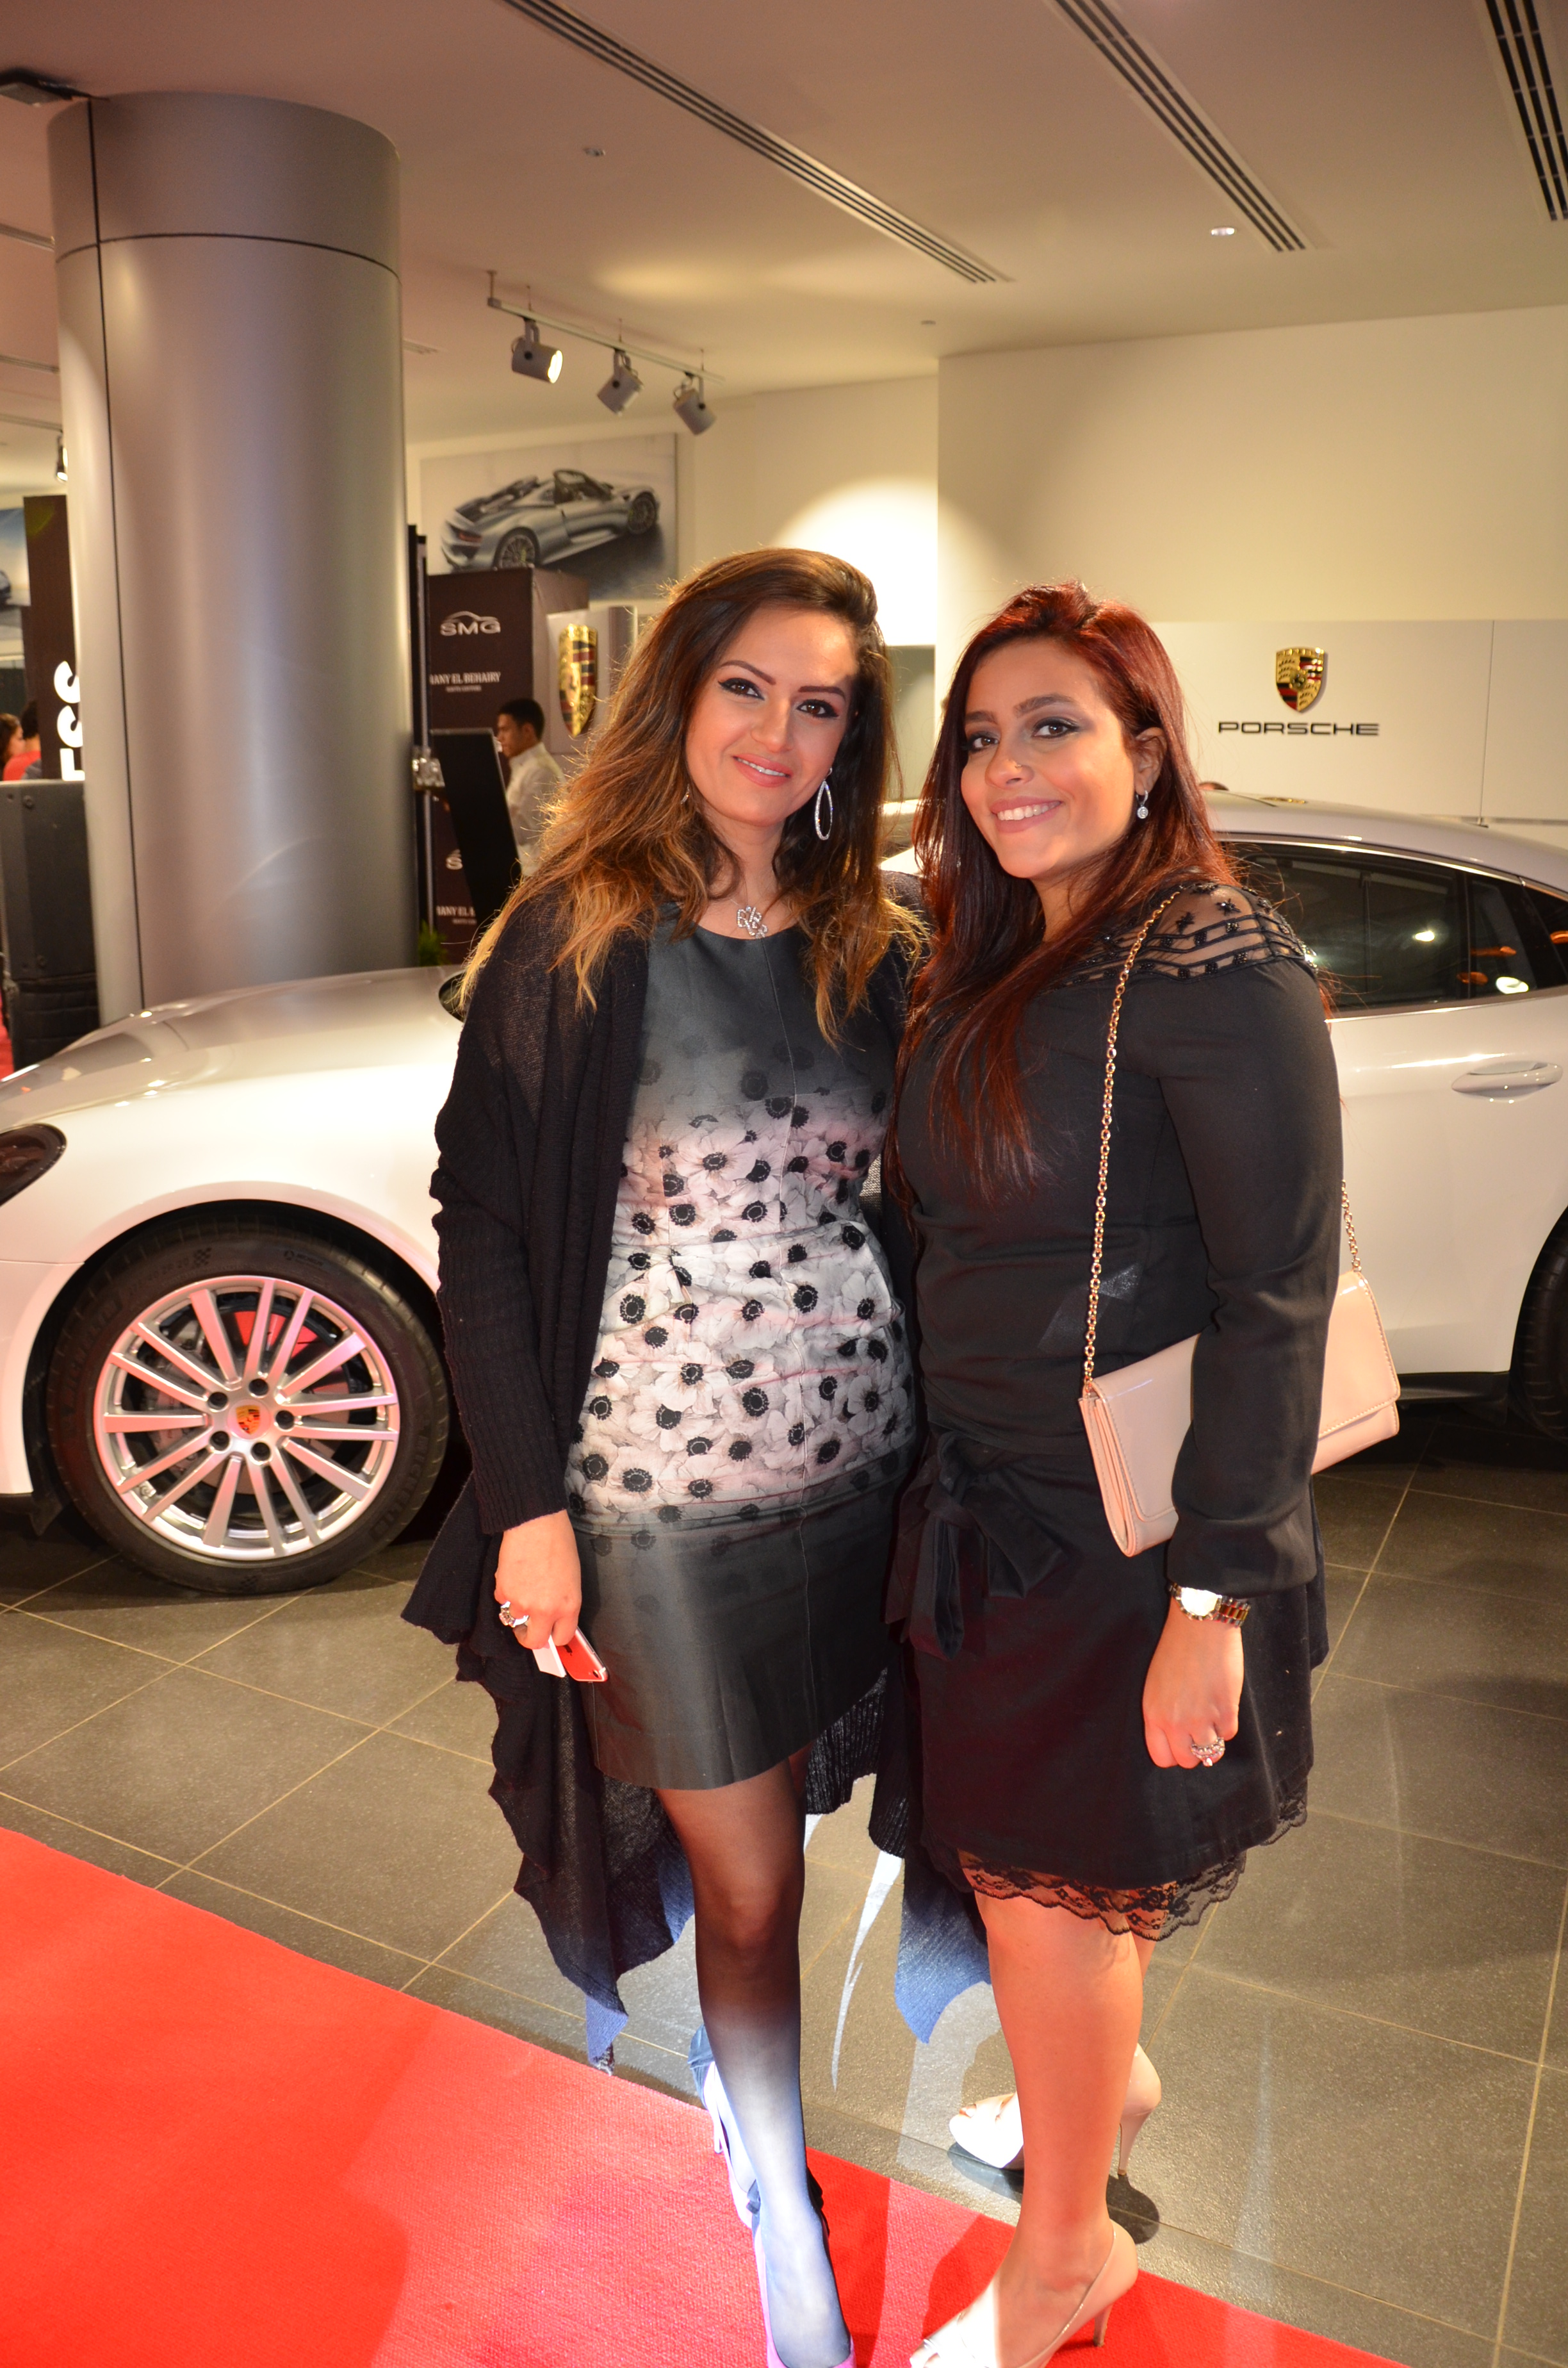 Ms. Indji Ghattas & Ms. Yomna Farahat